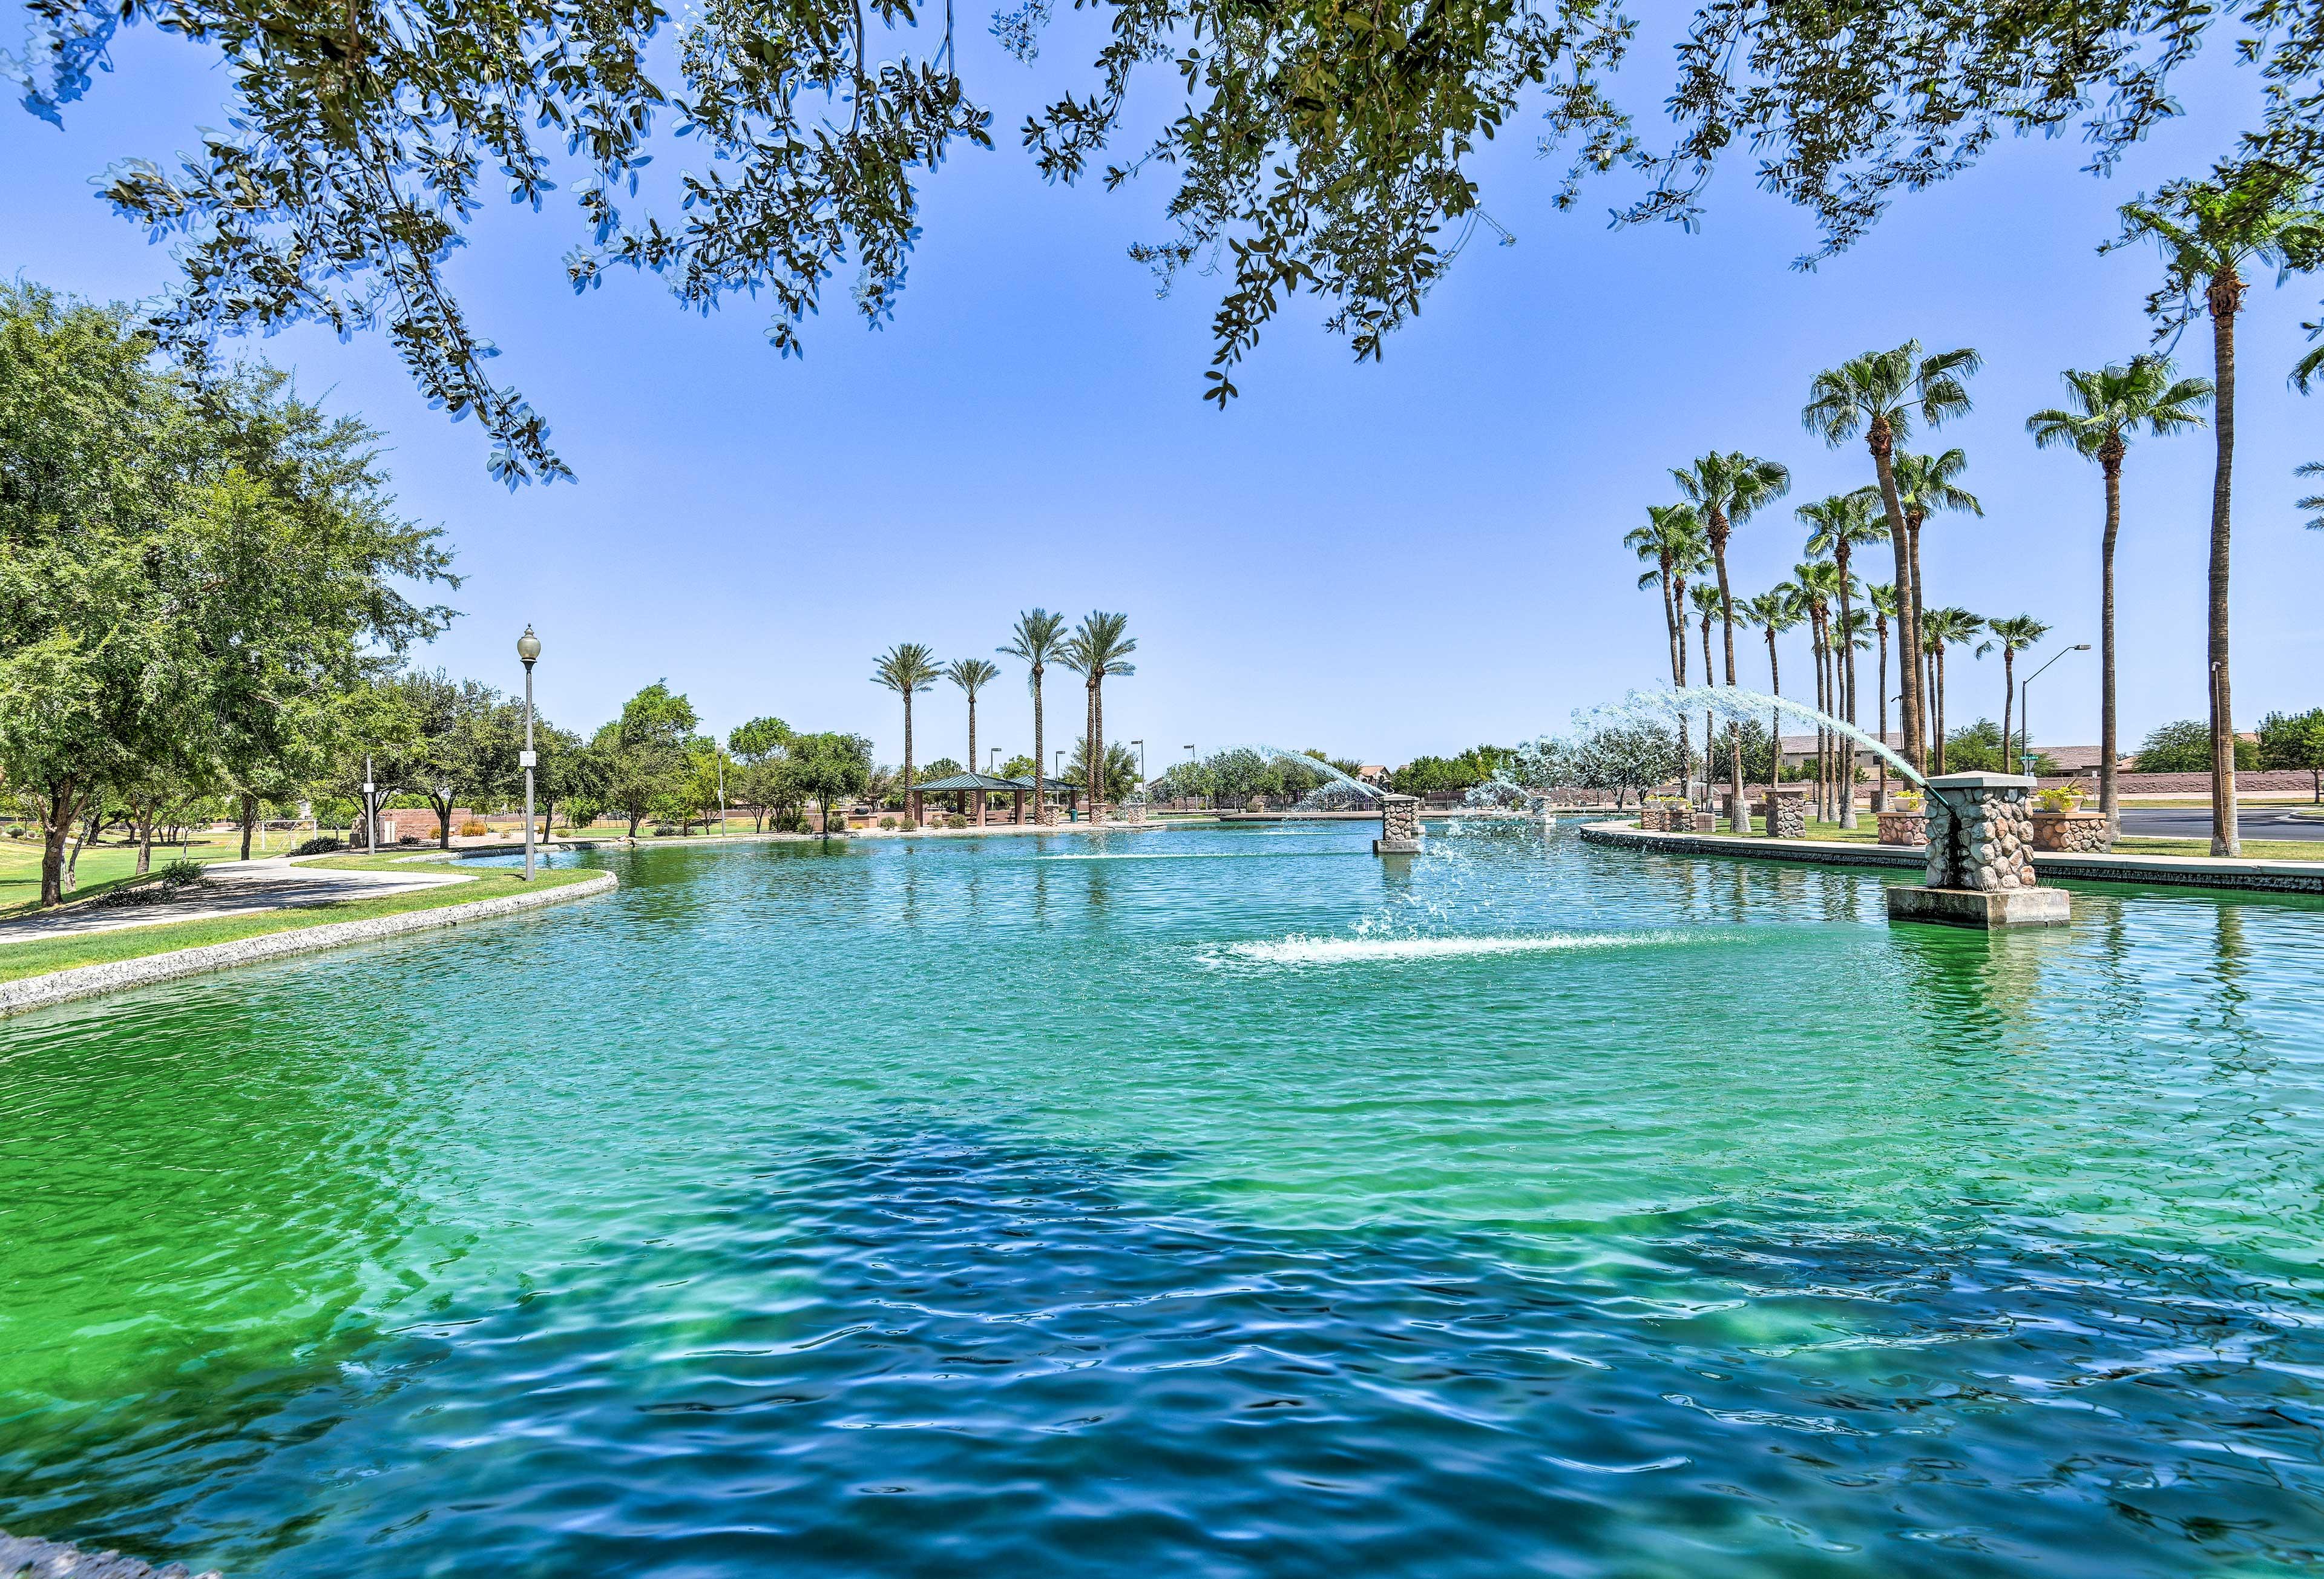 Wonder awaits in sunny Arizona!